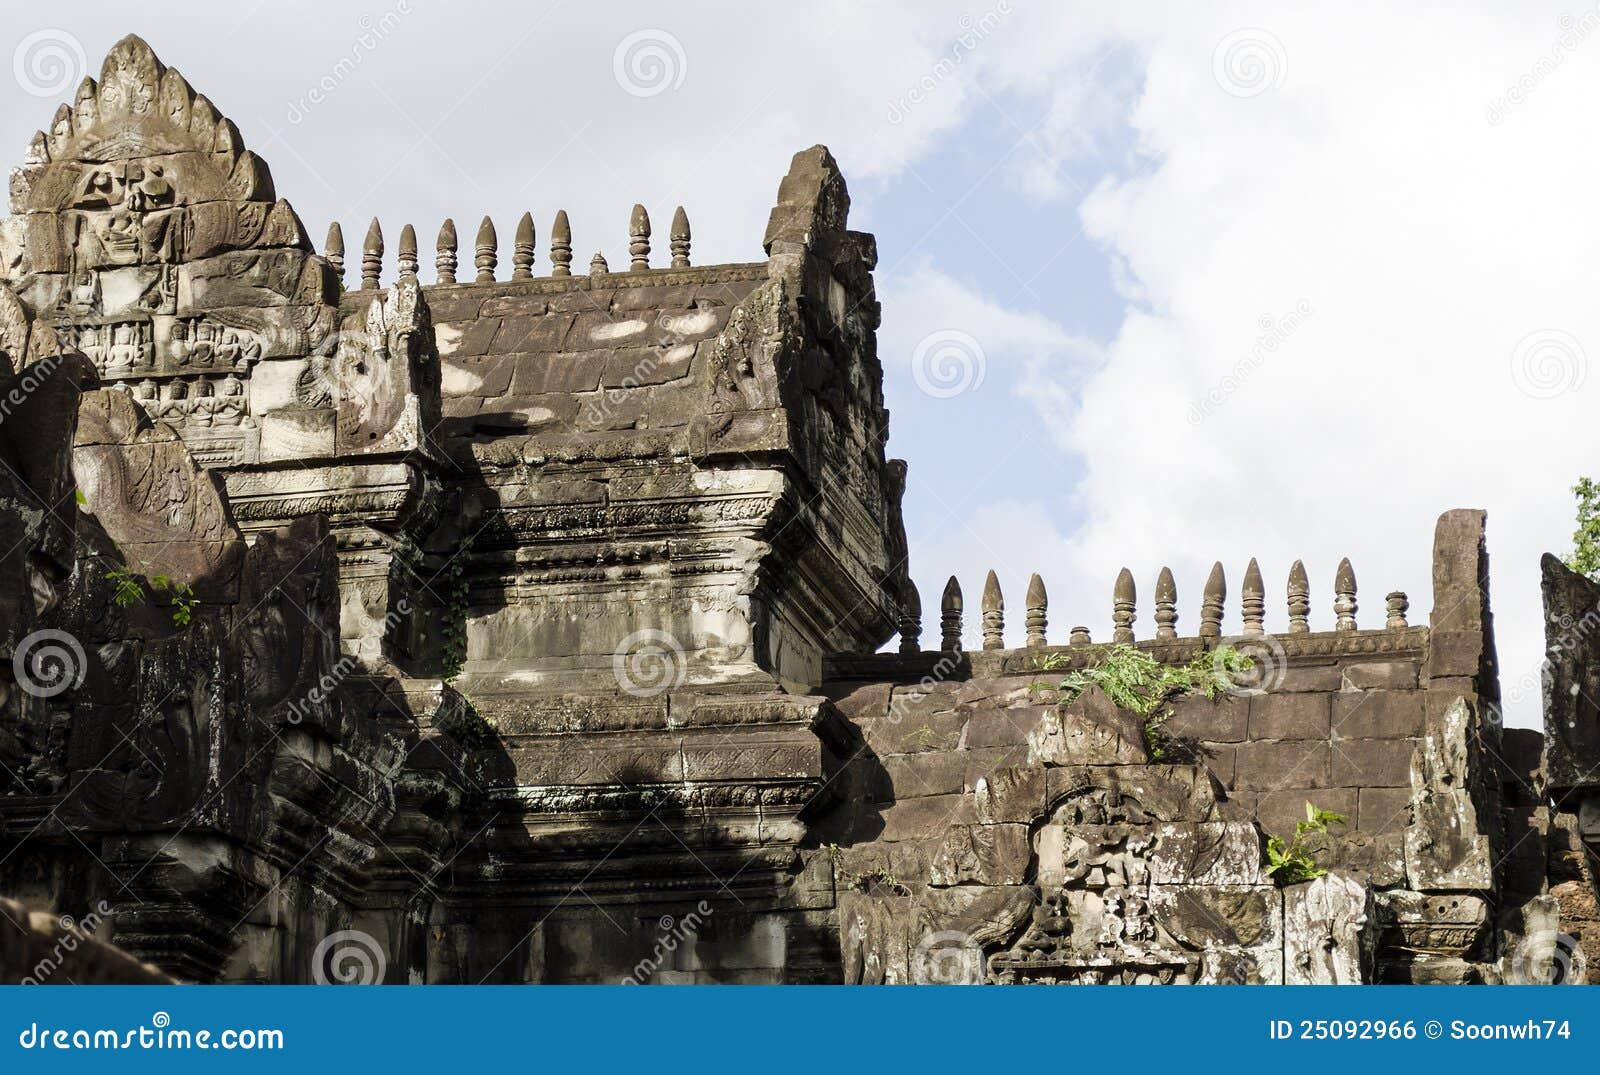 Banteay Samre Royalty Free Stock Image - Image: 25092966